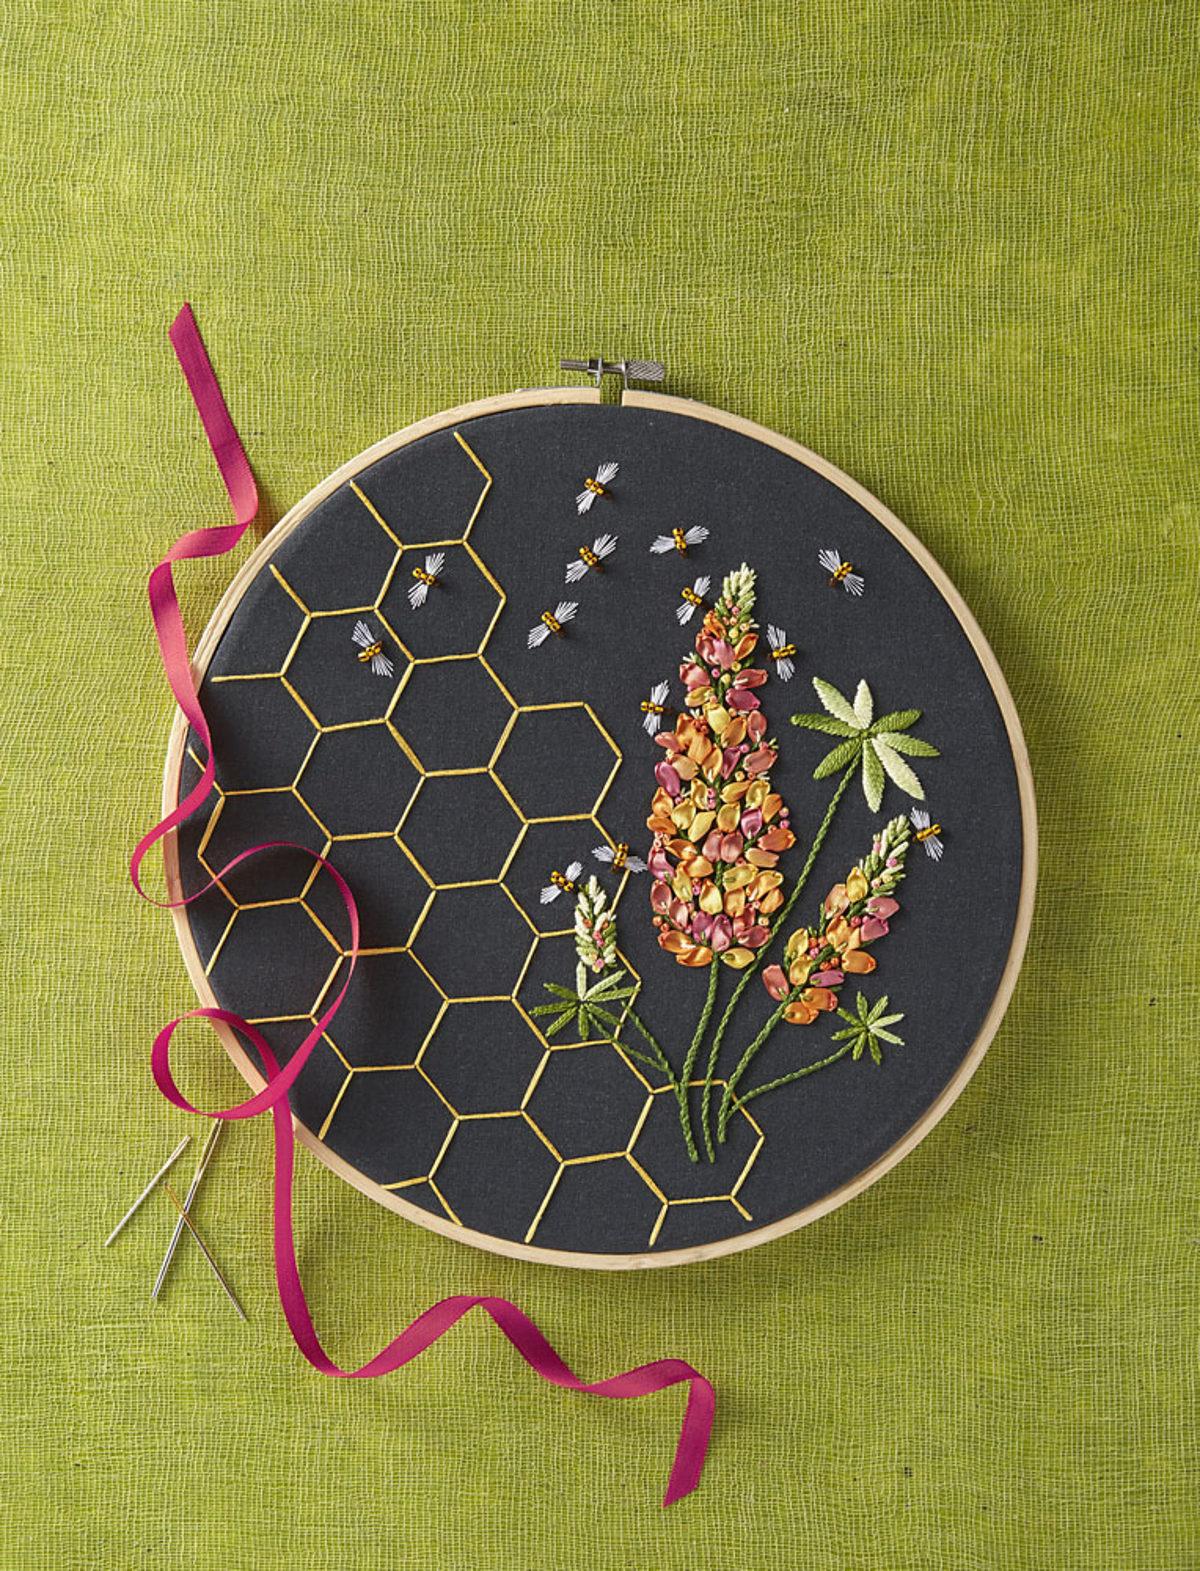 tambour-brode-au-ruban-hoop-art